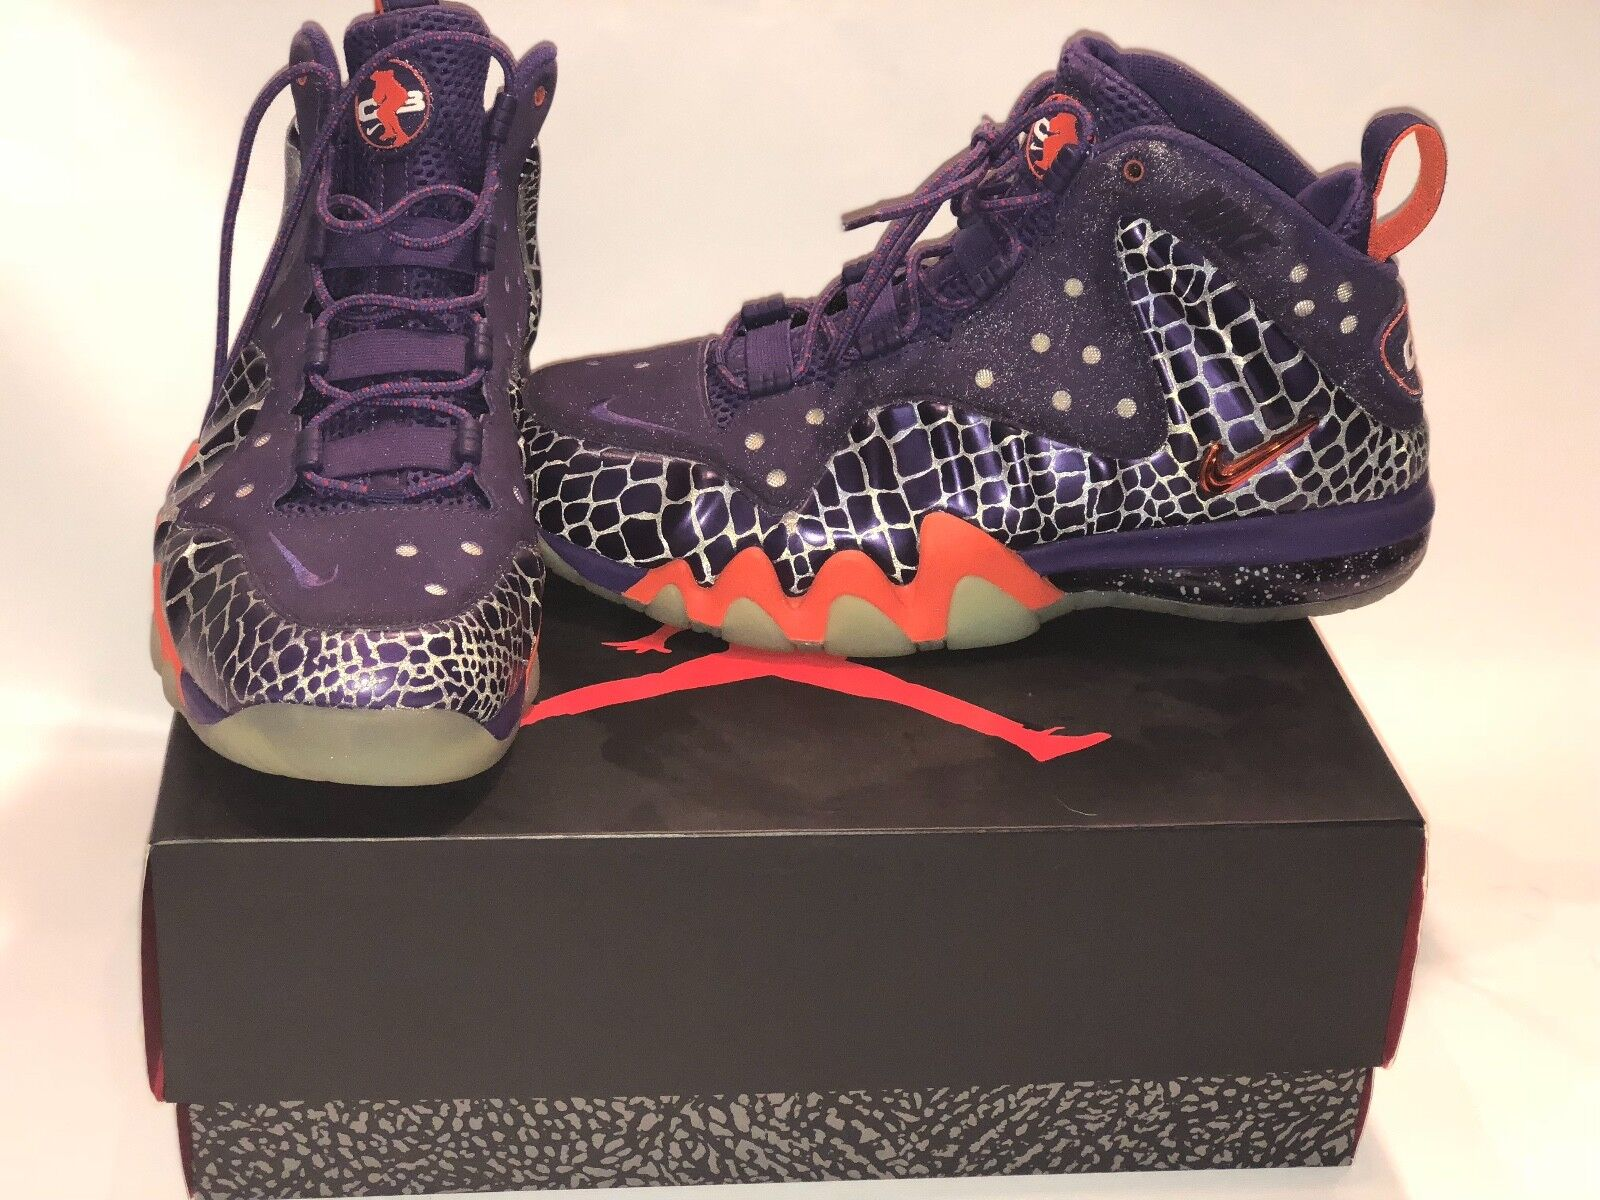 Nike Air Barkley Posite Max Sz 10 Suns Purple orange 555097 581 3M glow